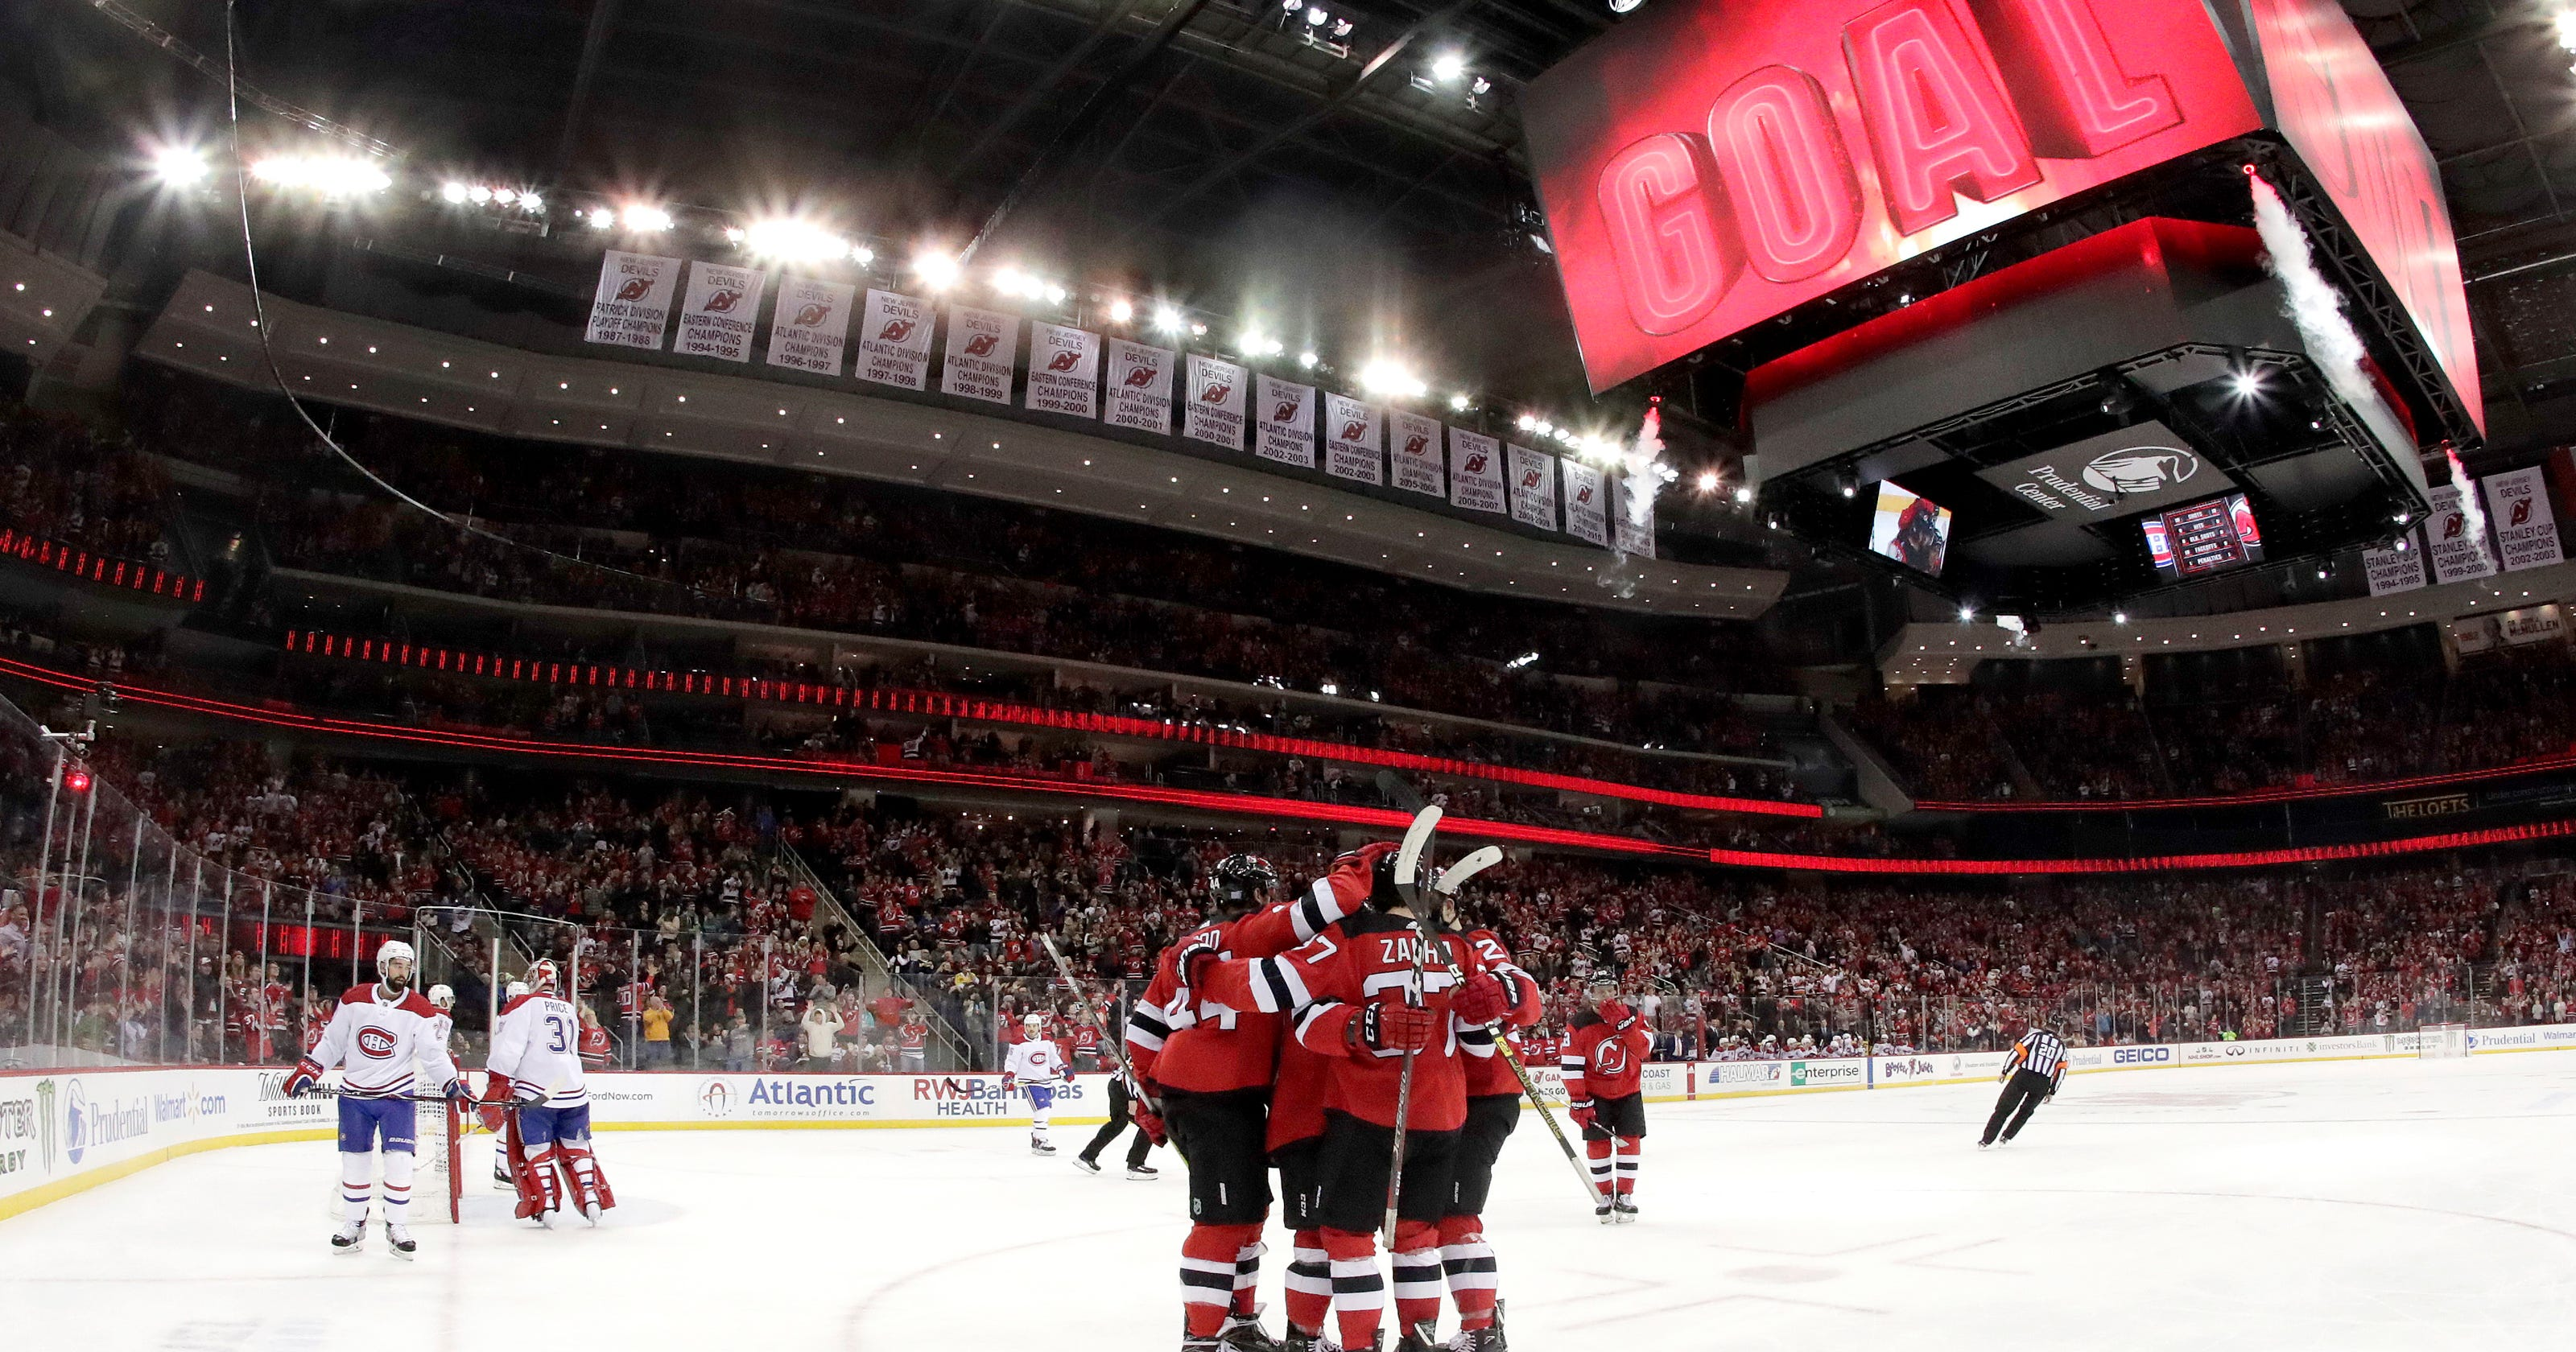 b1515c690 Zacha scores twice, Devils beat Canadiens 5-2